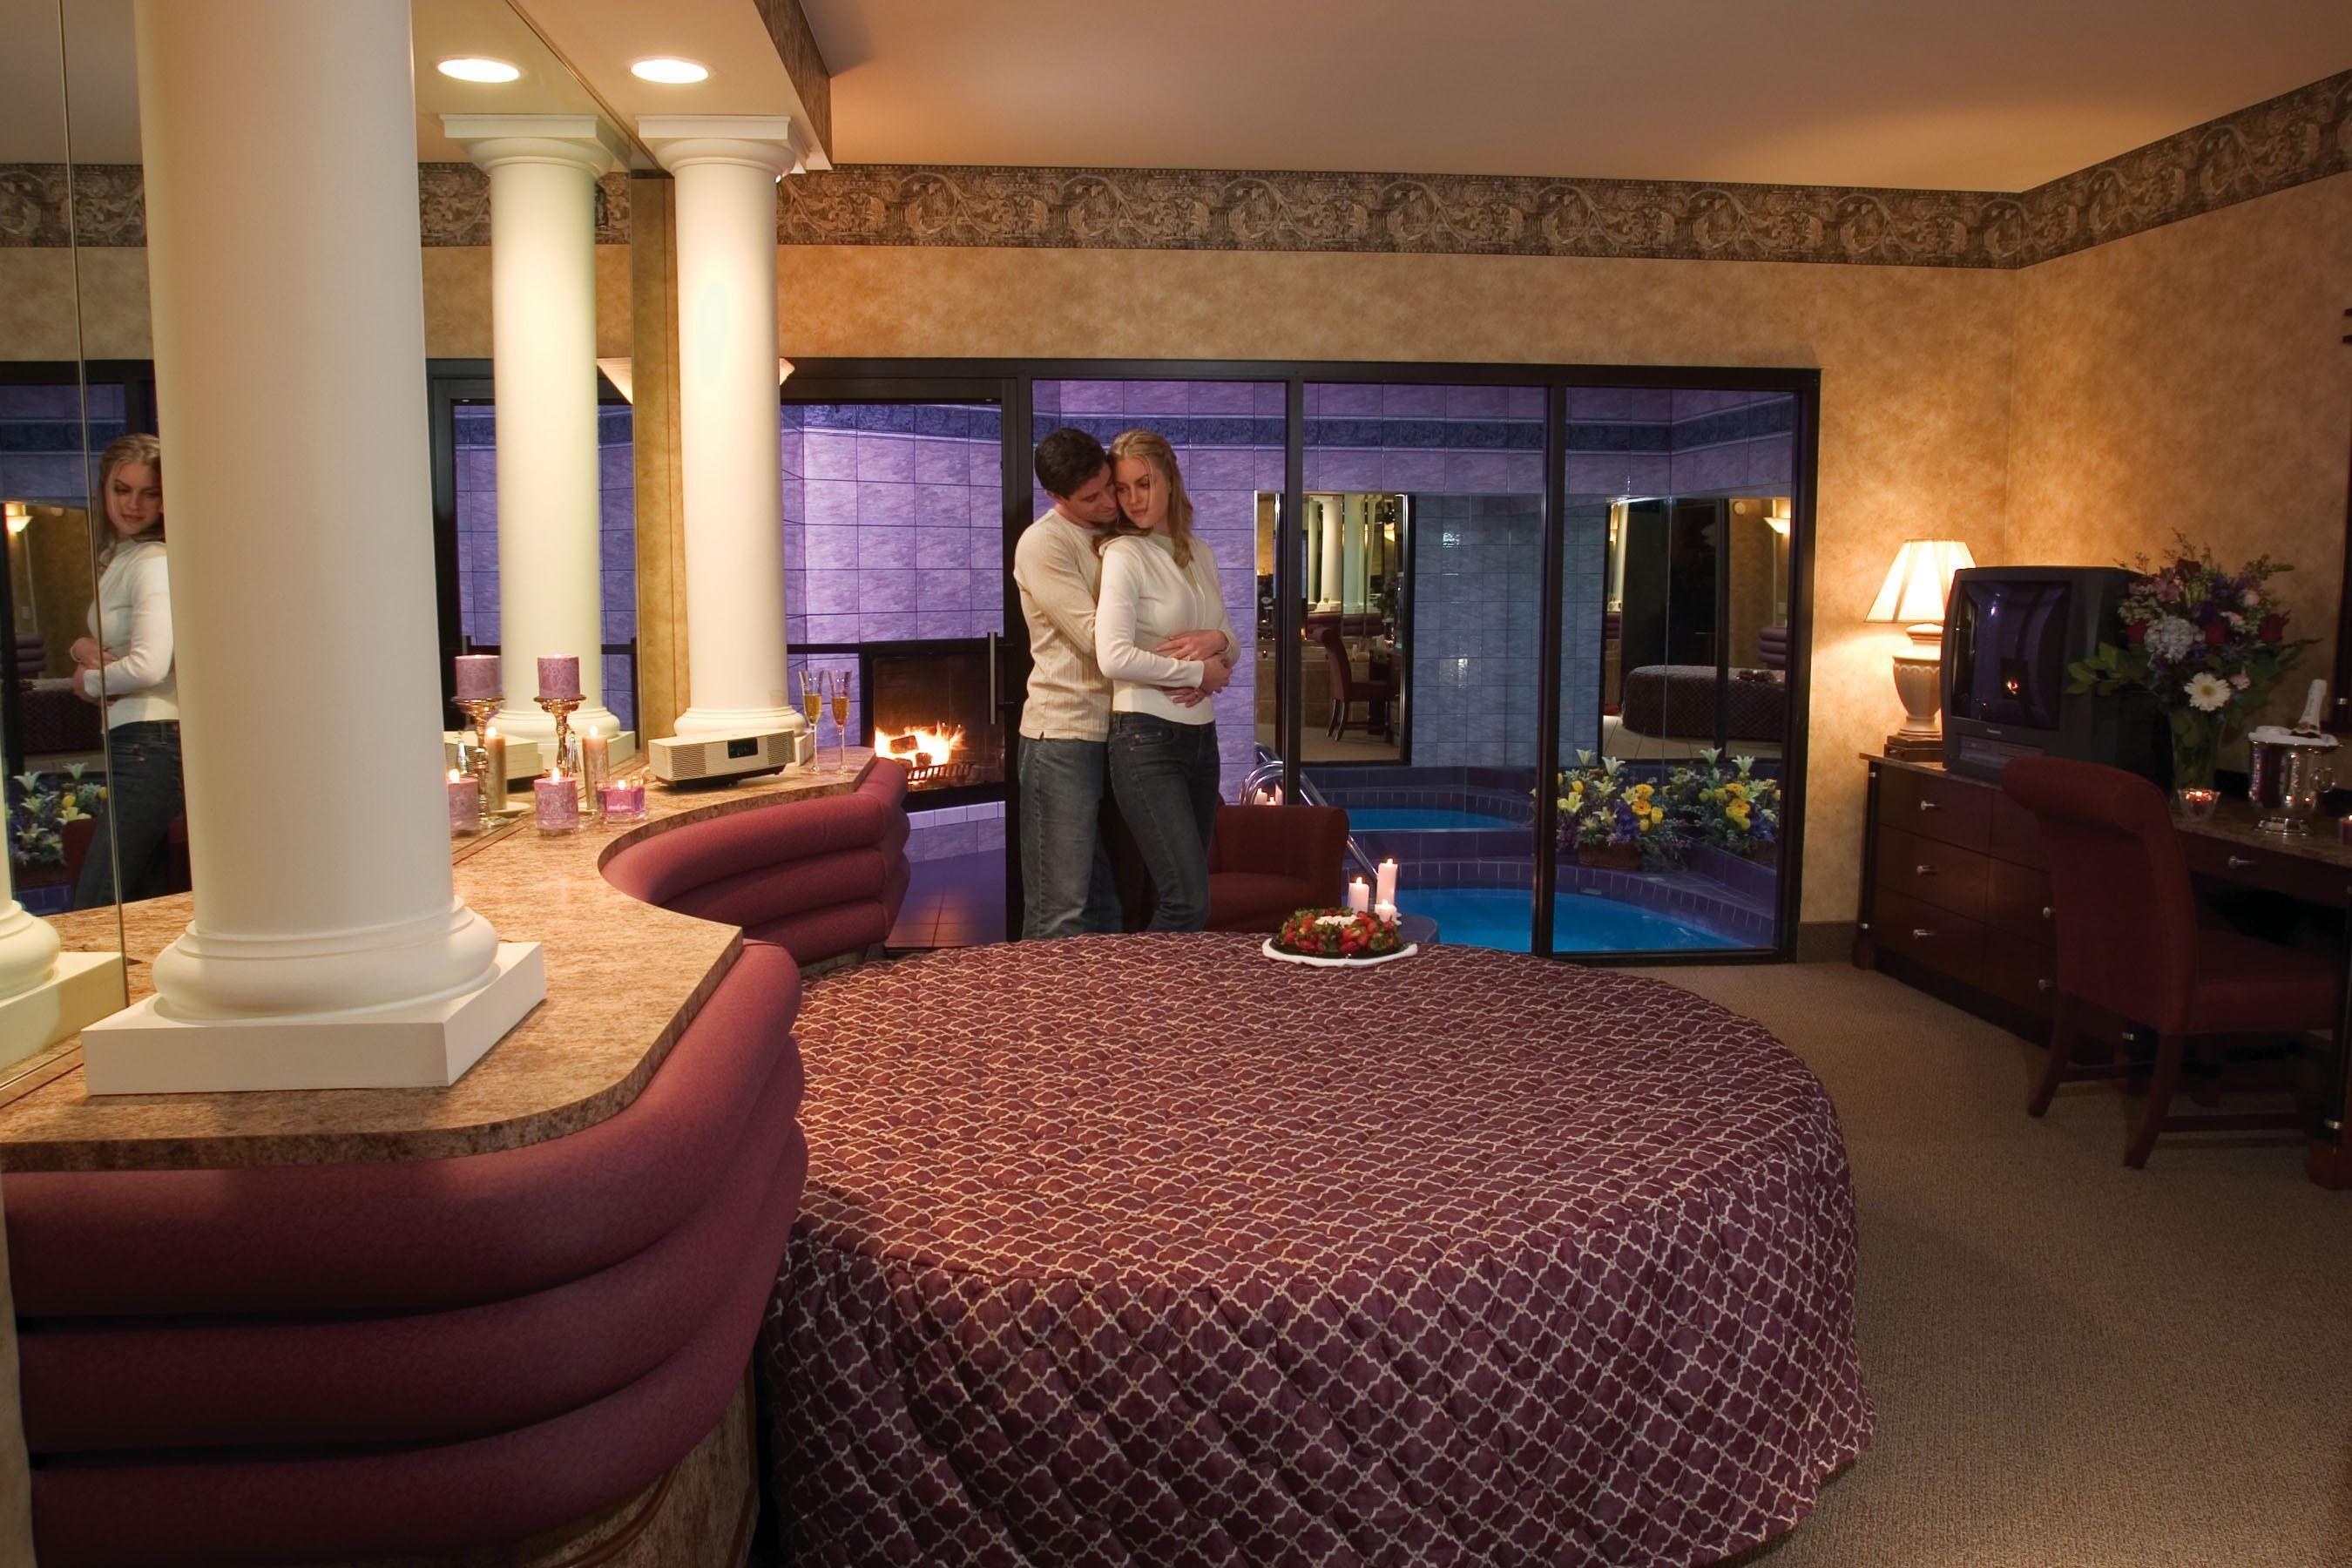 Oasis Bedroom Furniture Dianas Oasis Bedroom Romantic Getaways Pinterest Resorts